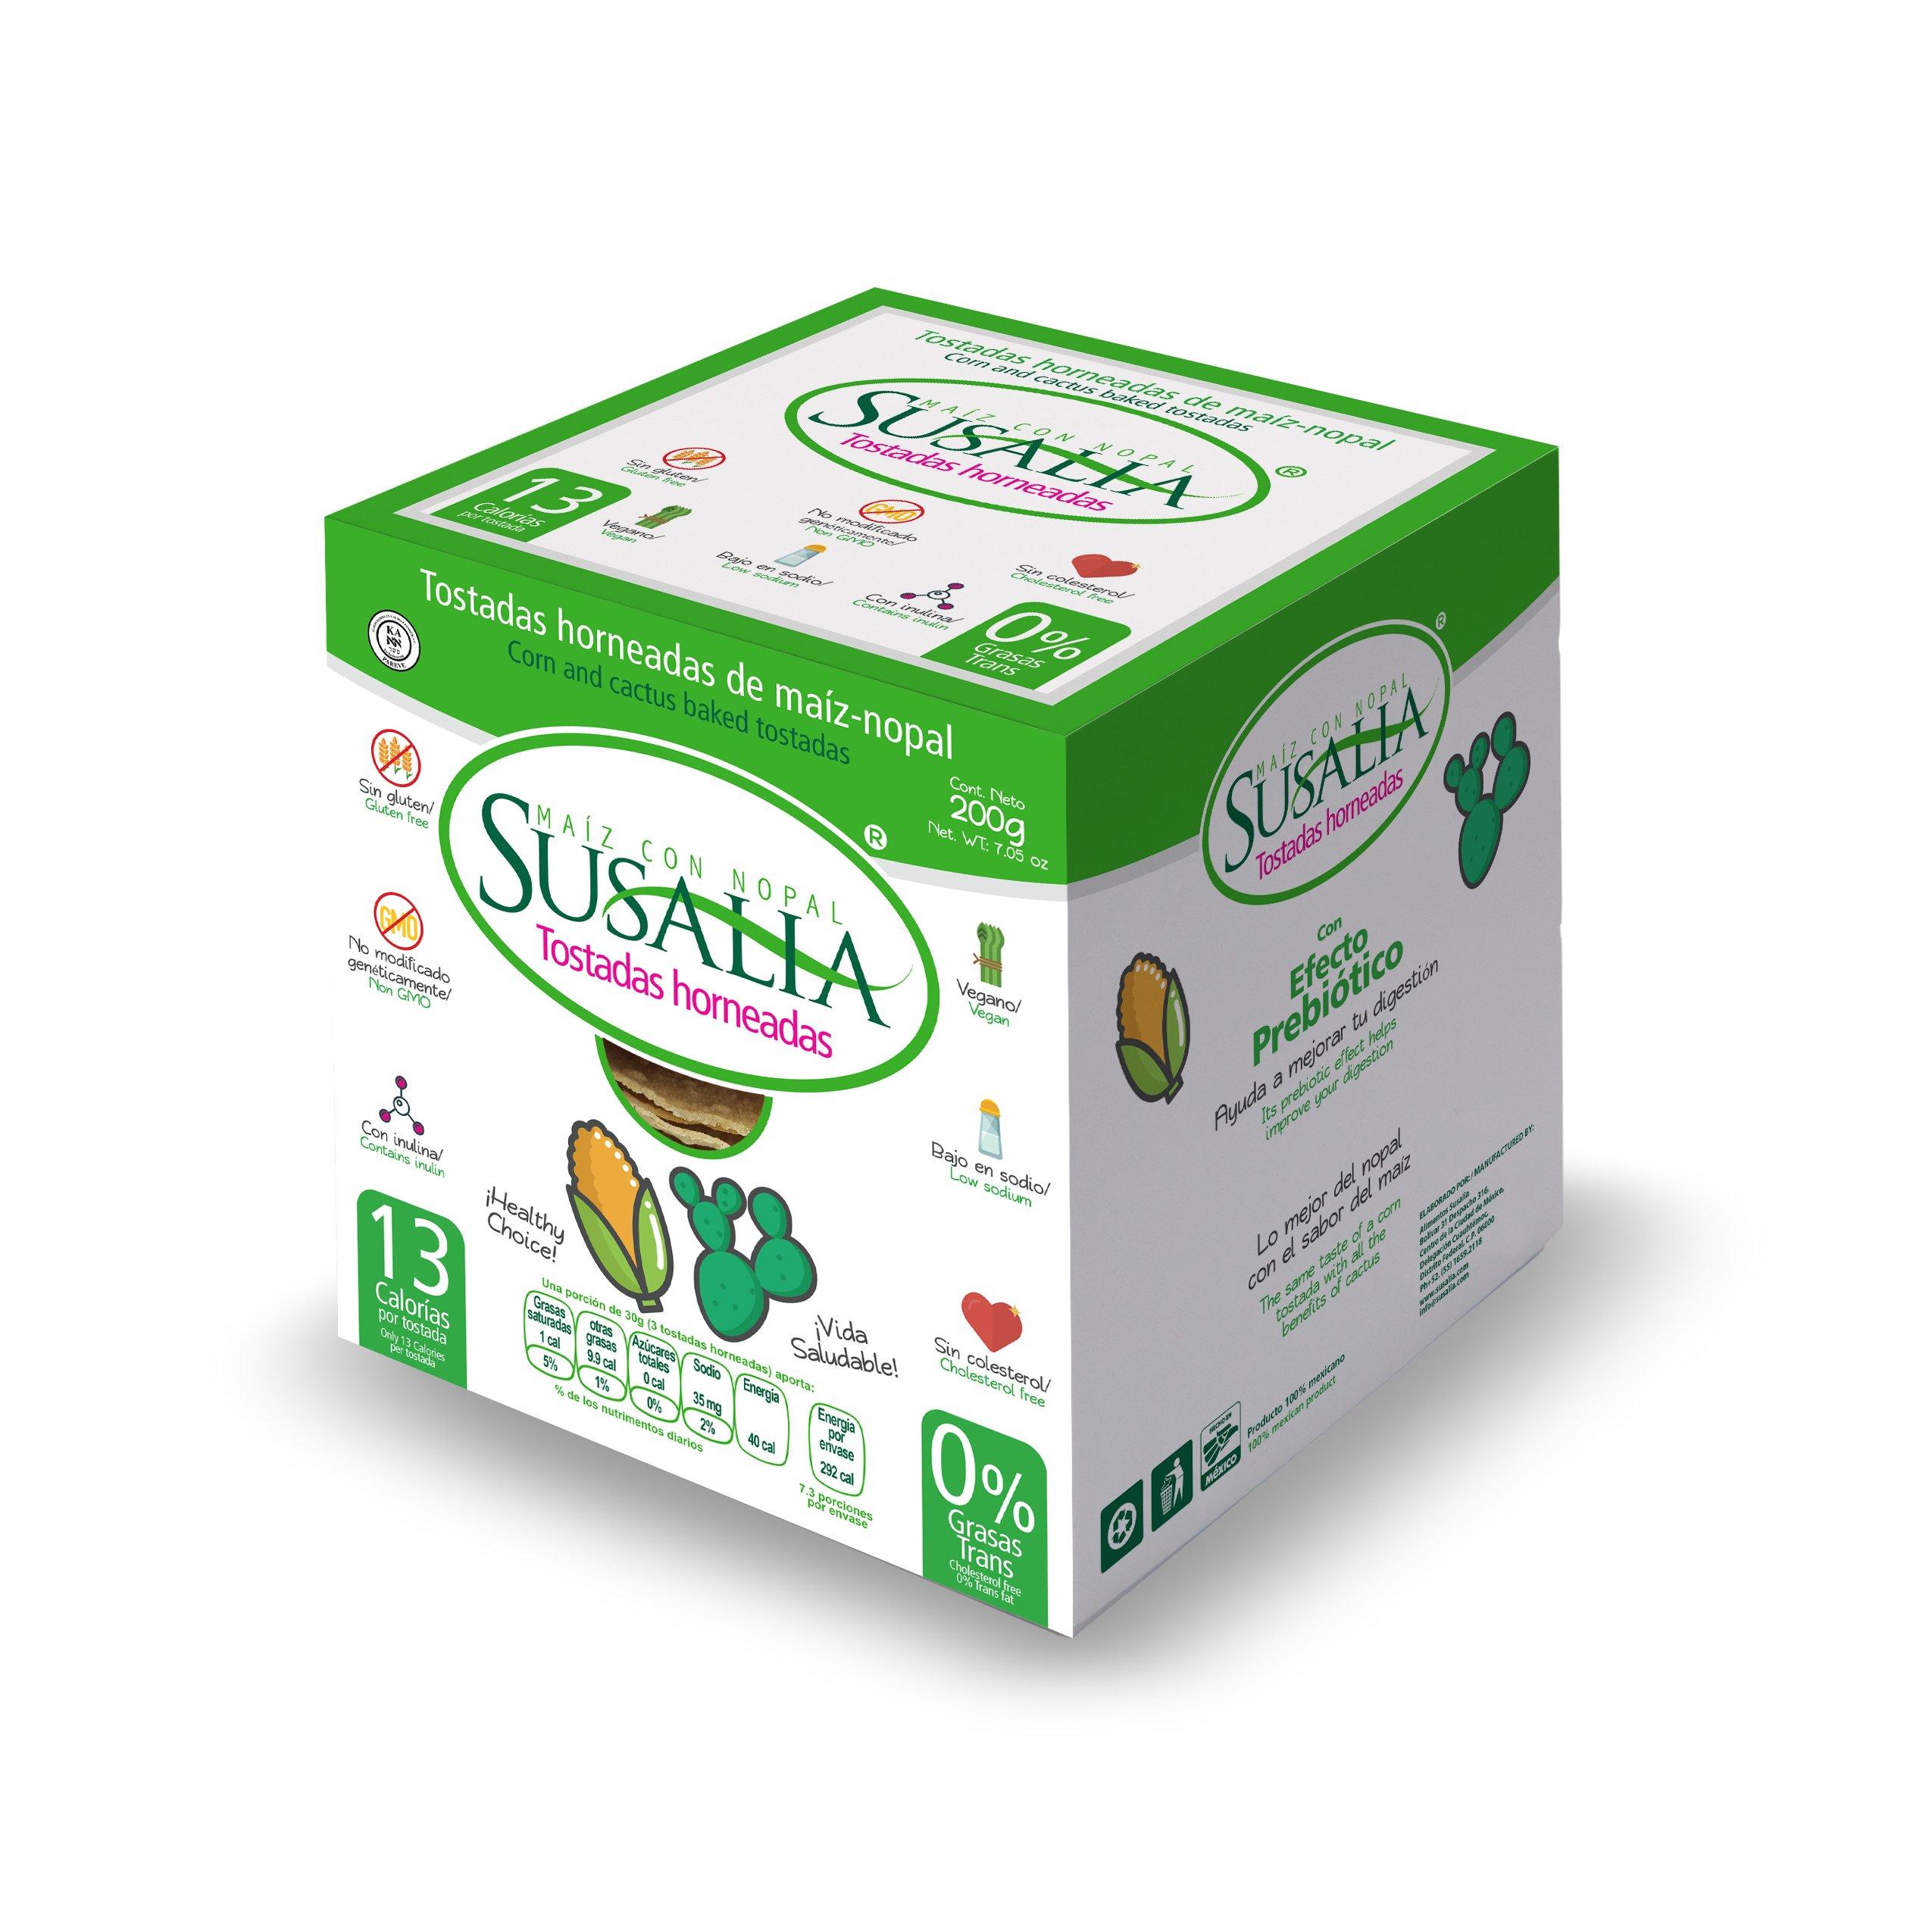 Corn and Cactus baked Tostada with prebiotic effect 13 Calories per Tostada VEGAN